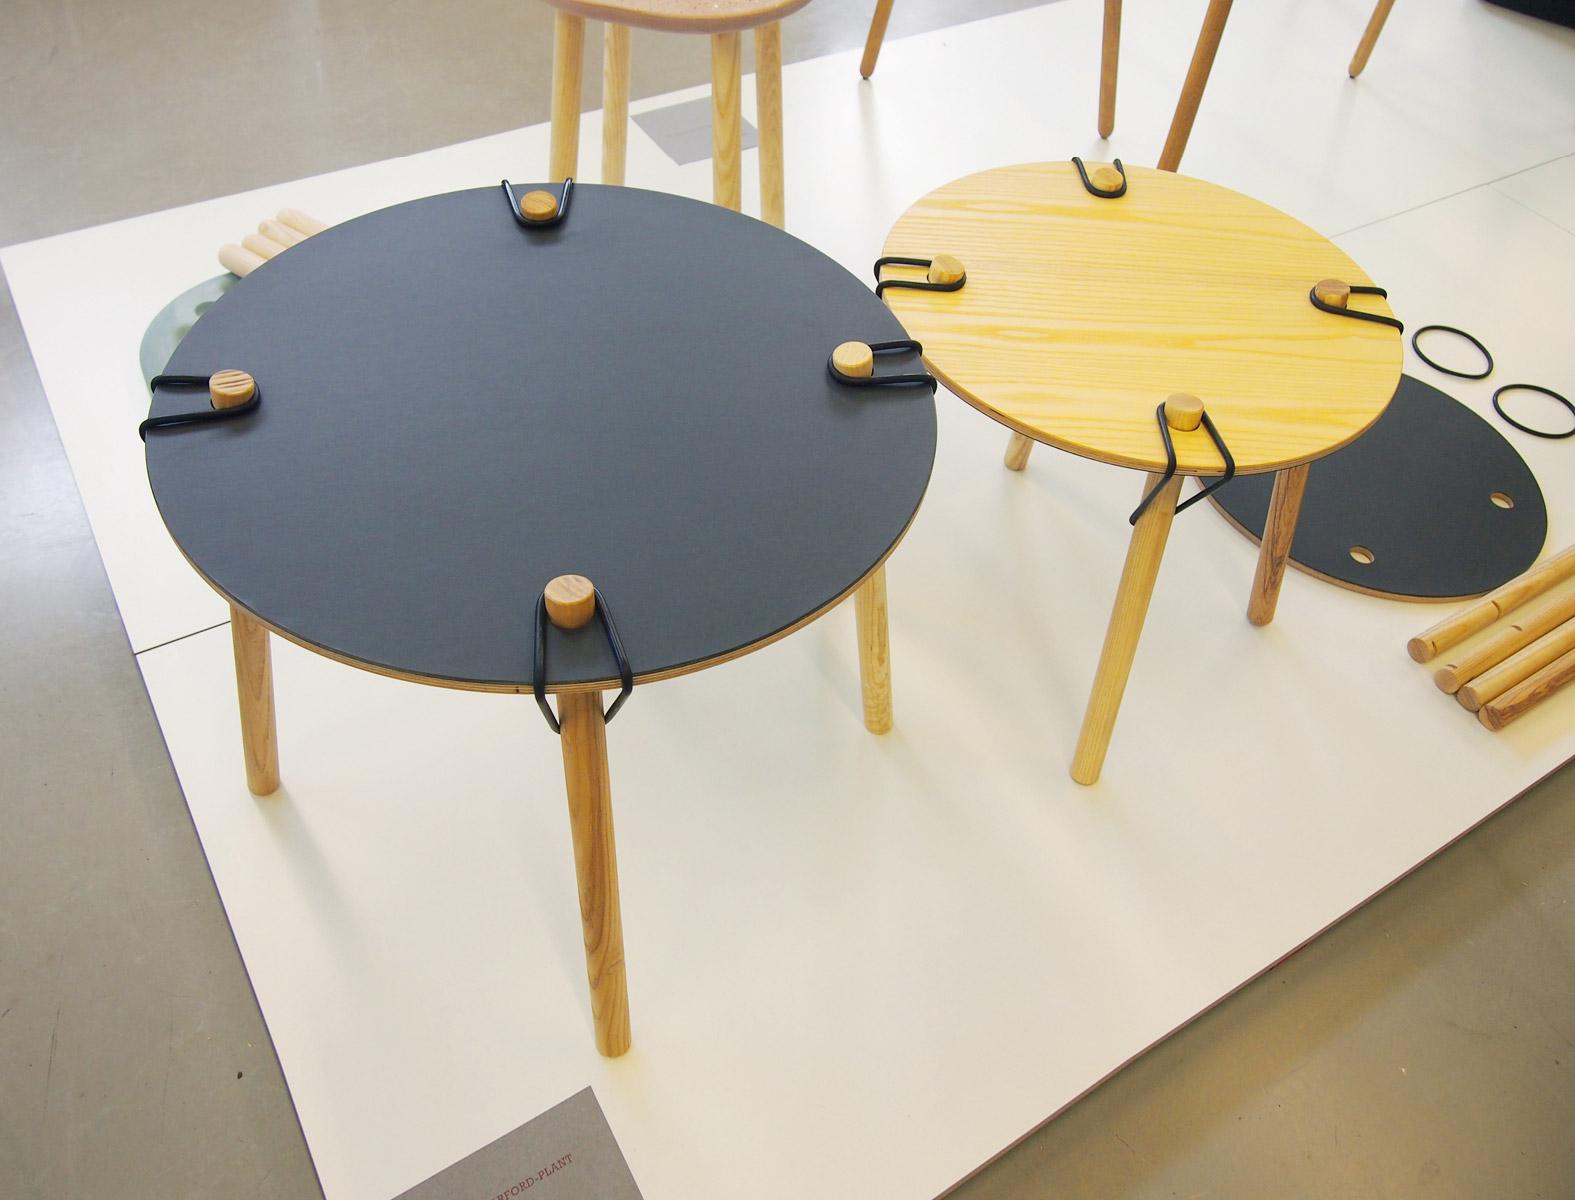 Student work product furniture design ba hons degree for Furniture design course